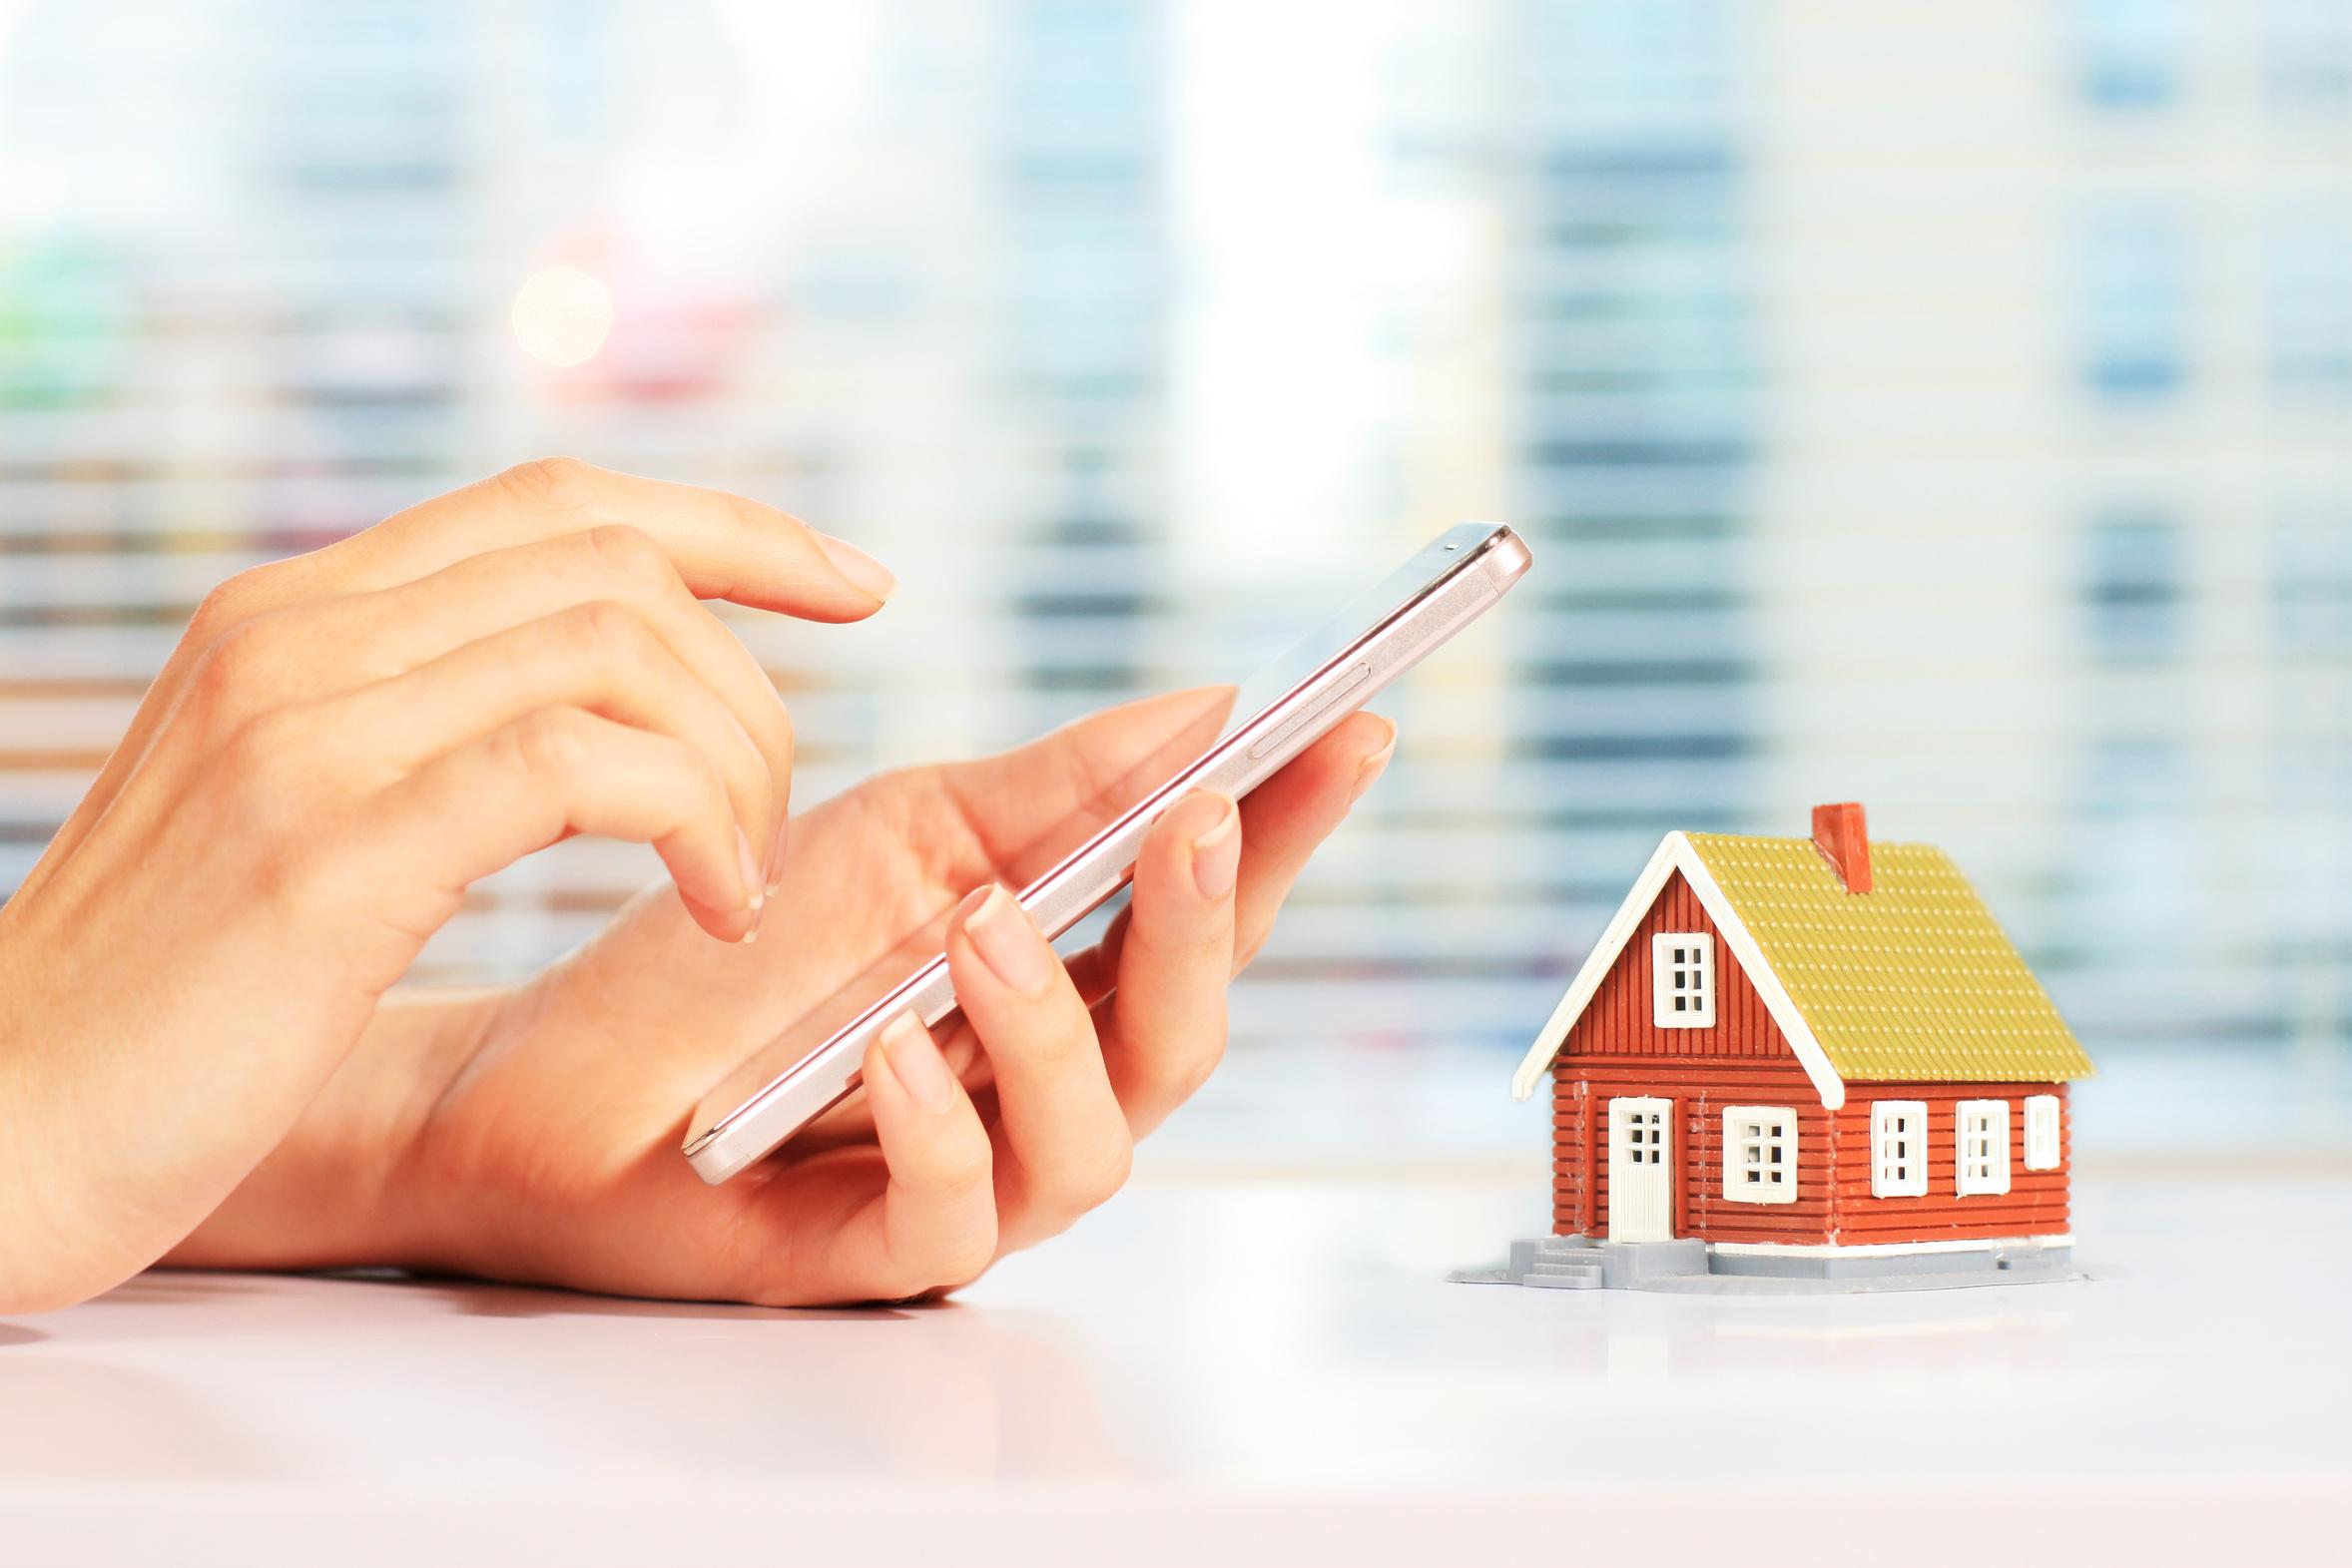 【AUSTPRO珀斯地产专栏】三个切实可行的珀斯房产投资规划